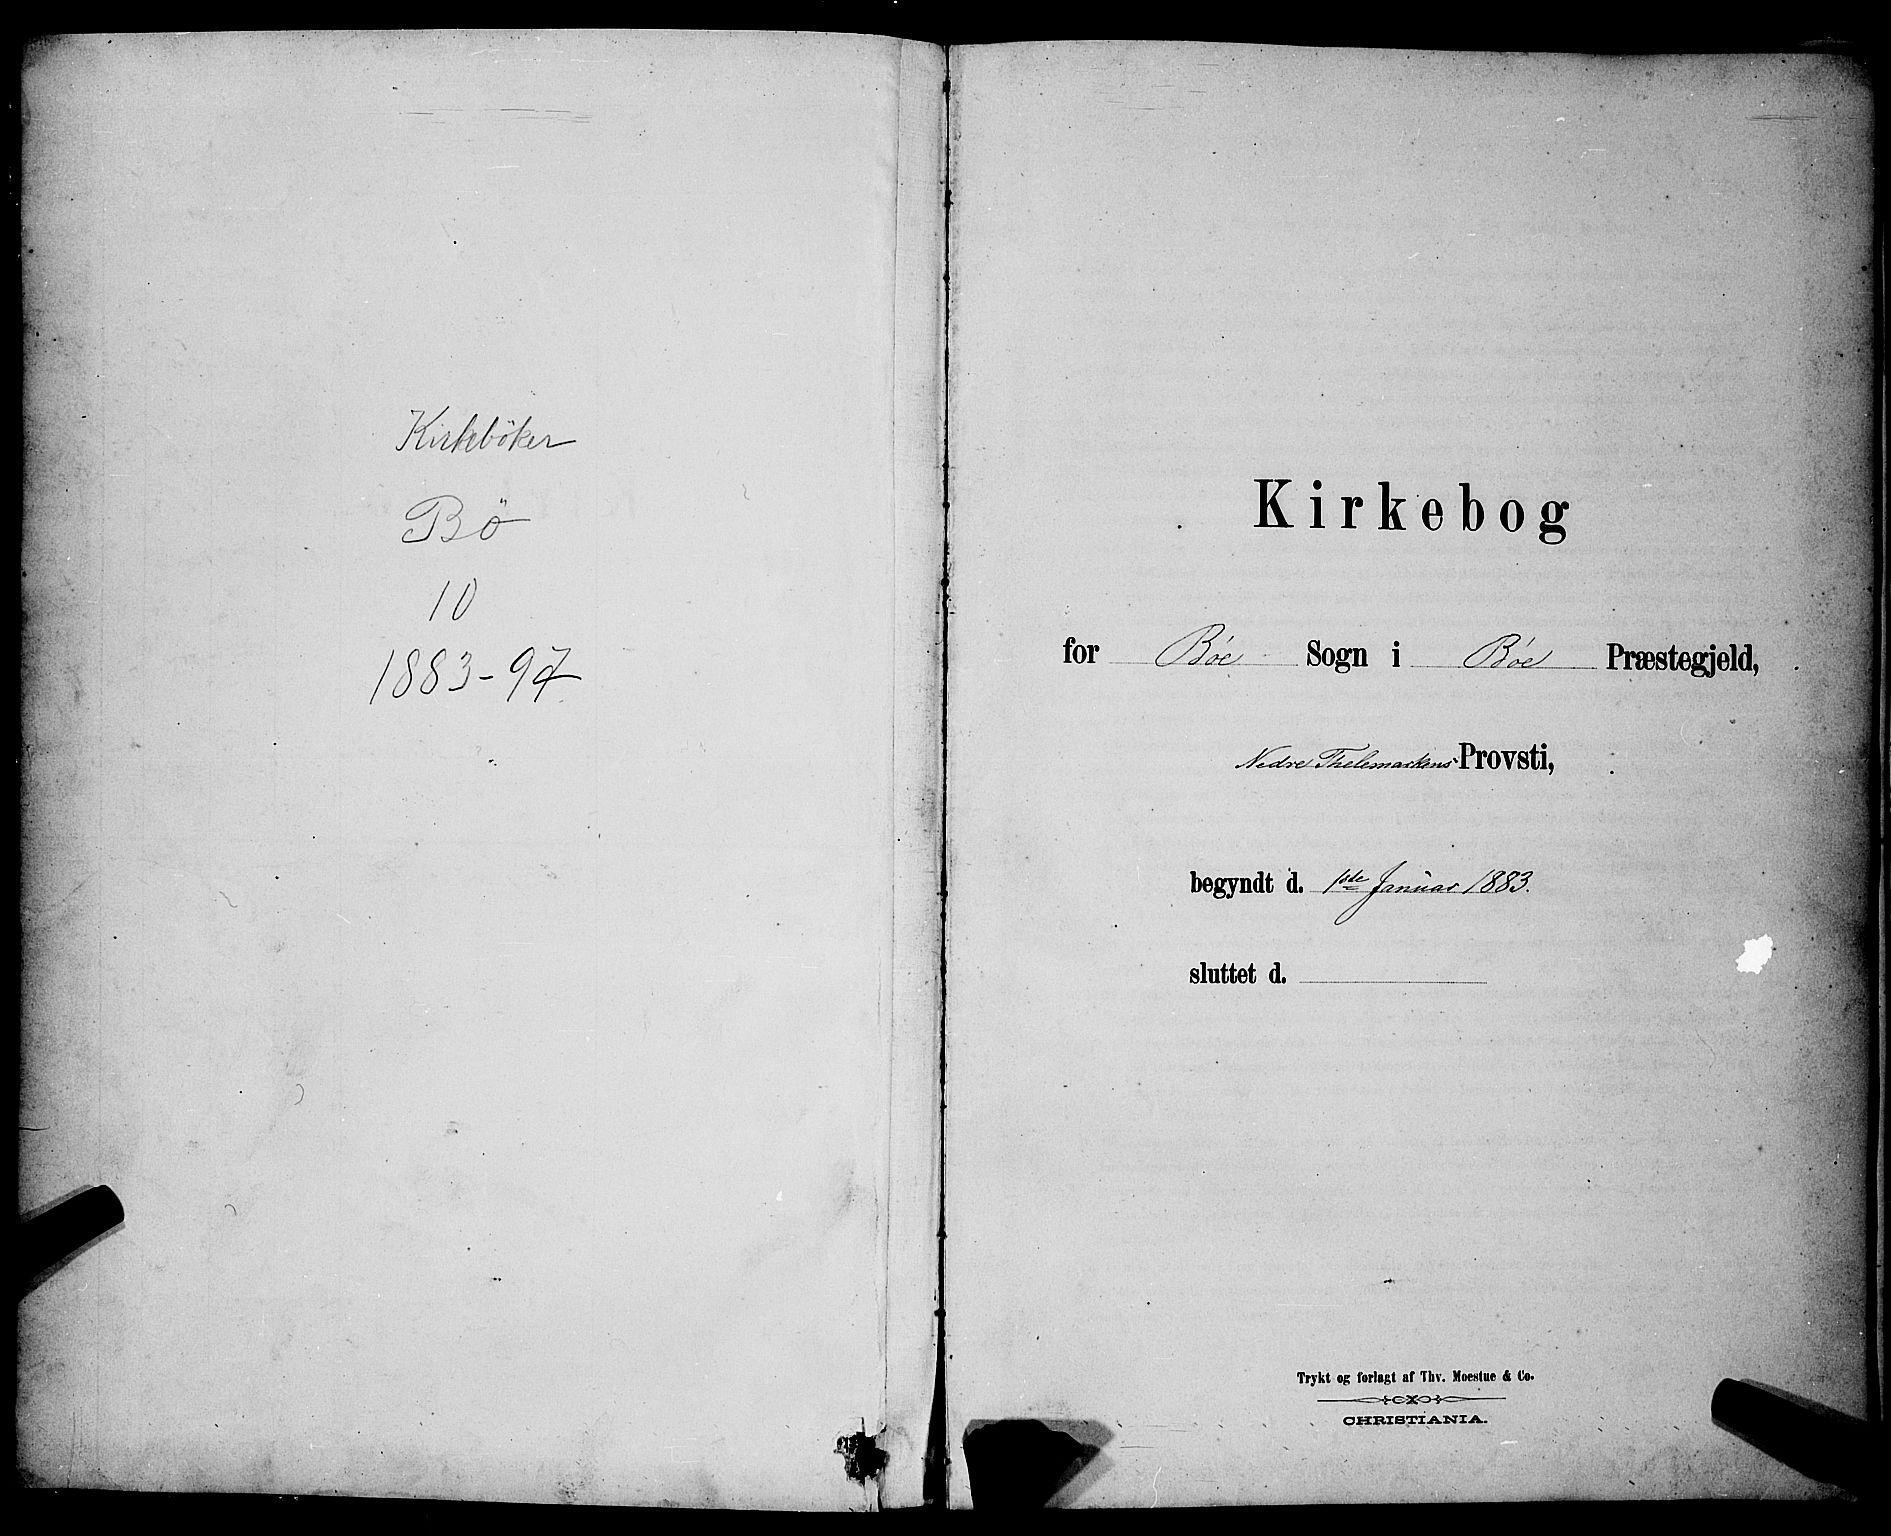 SAKO, Bø kirkebøker, G/Ga/L0005: Klokkerbok nr. 5, 1883-1897